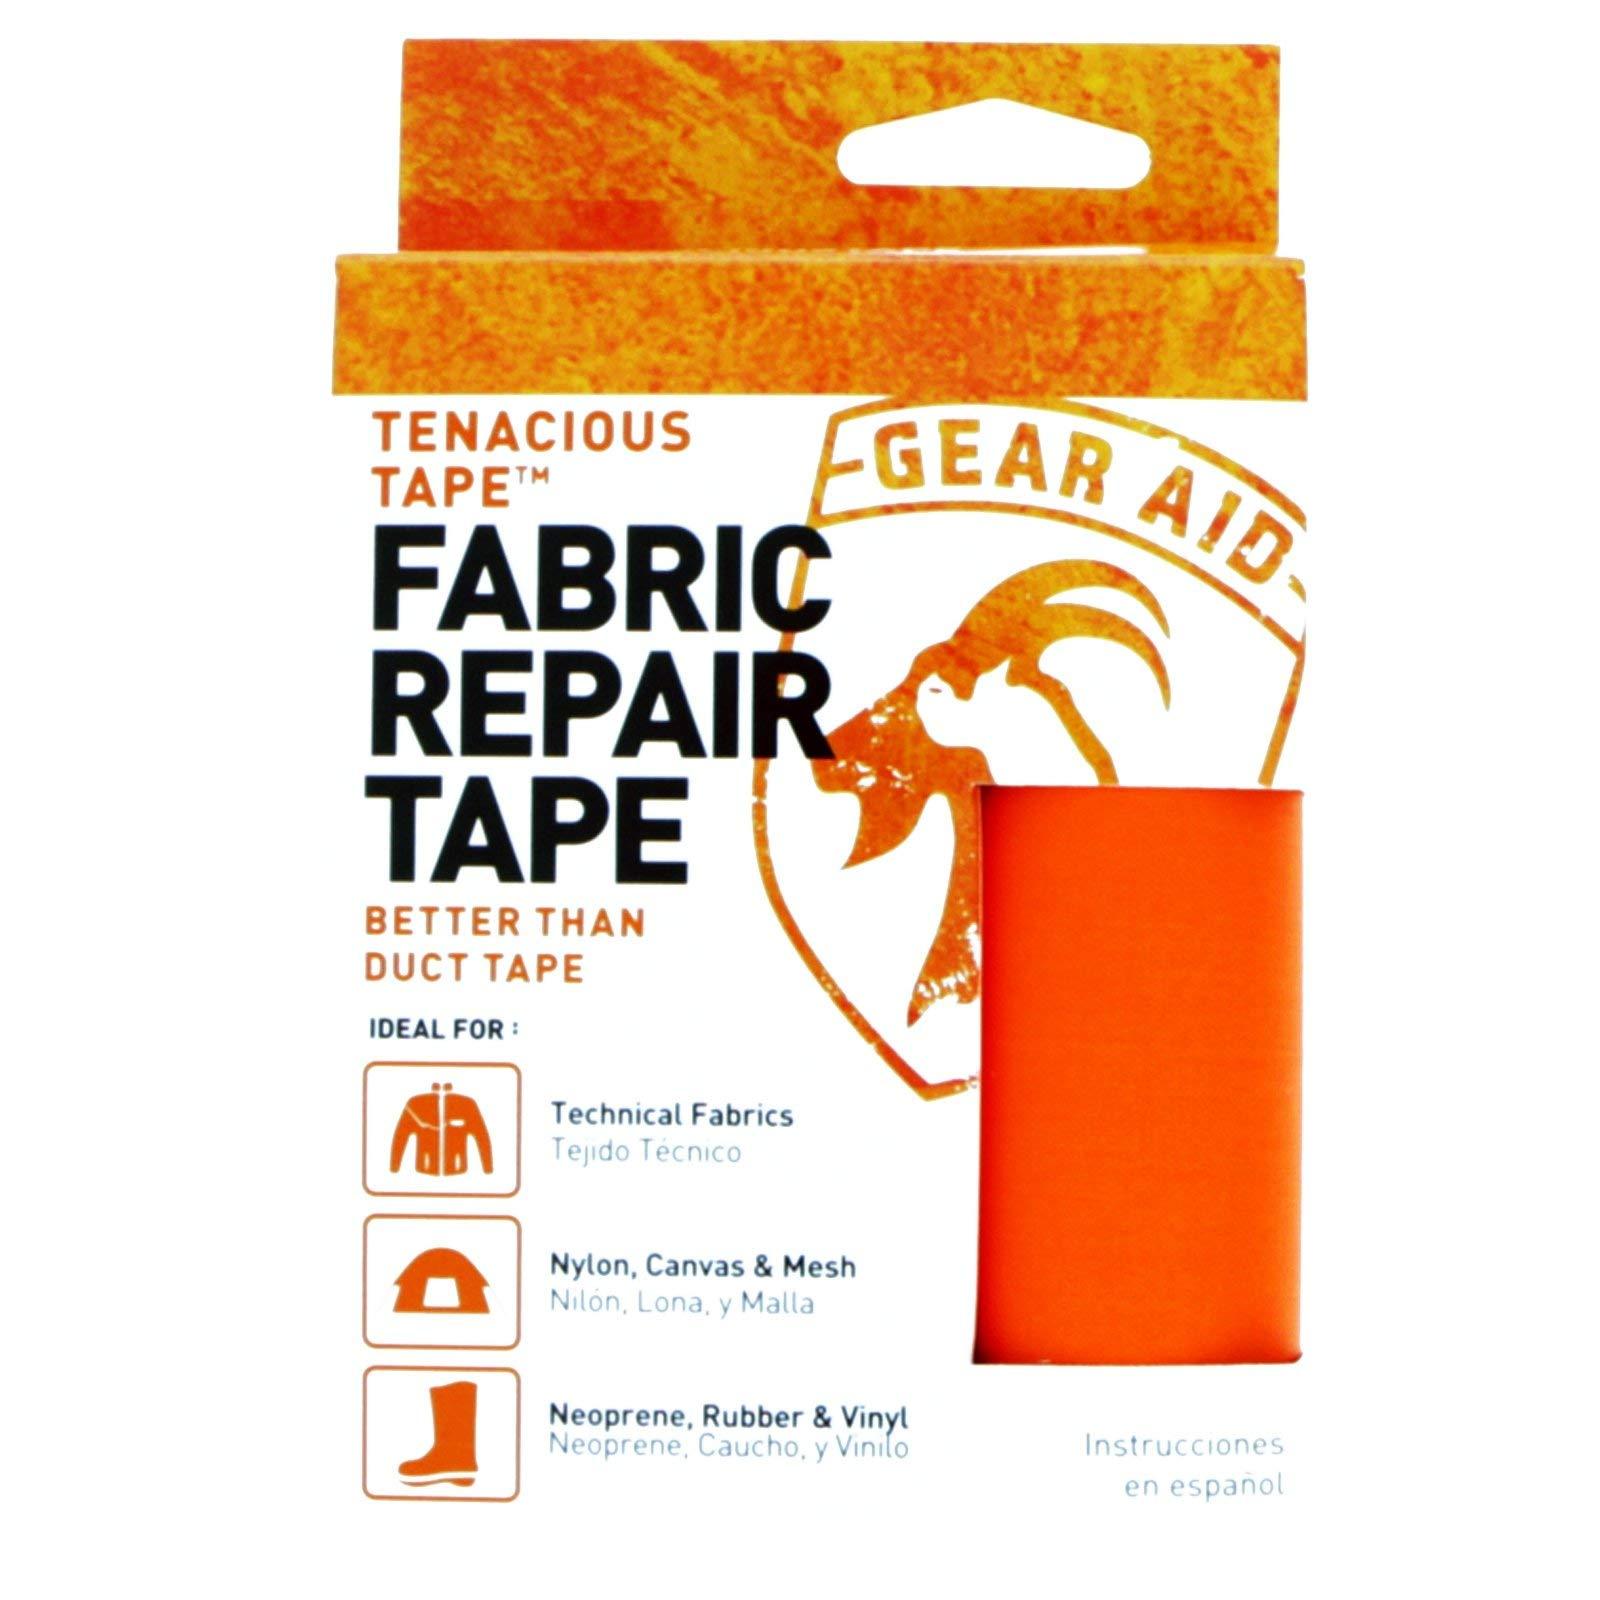 "Gear Aid Tenacious Tape Nylon Repair Tape for Fabric and Vinyl, 3"" x 20"", (Orange) by Gear Aid (Image #1)"